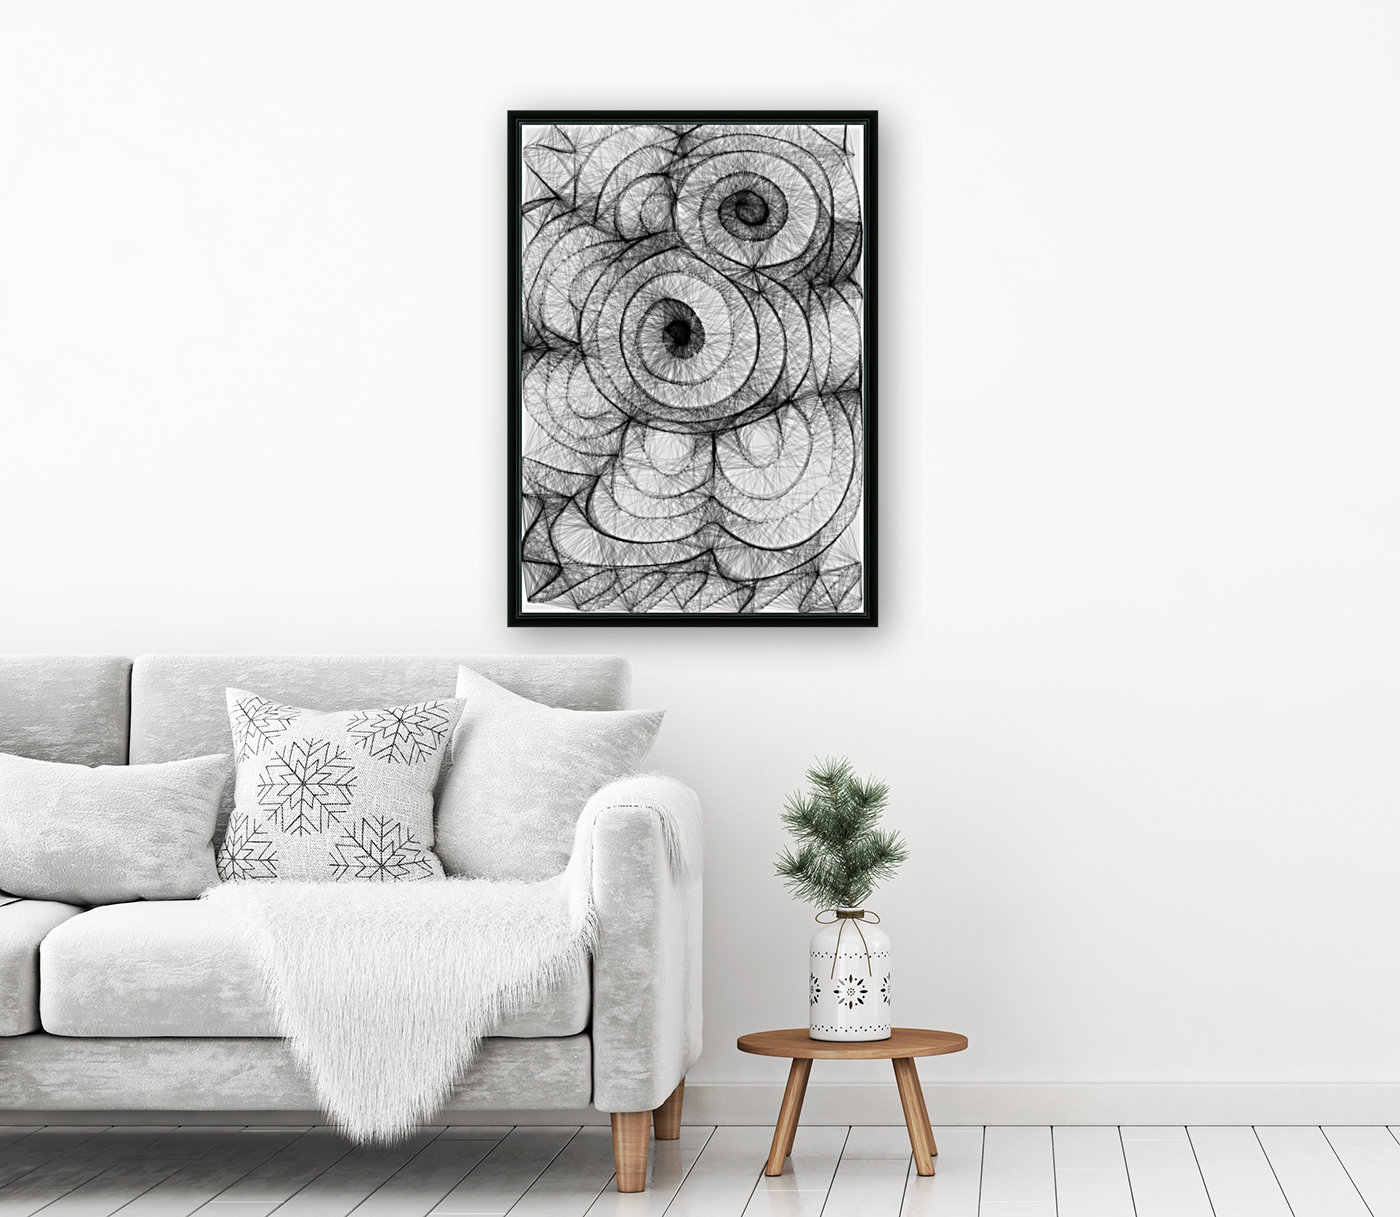 Circled in infiniti  Art